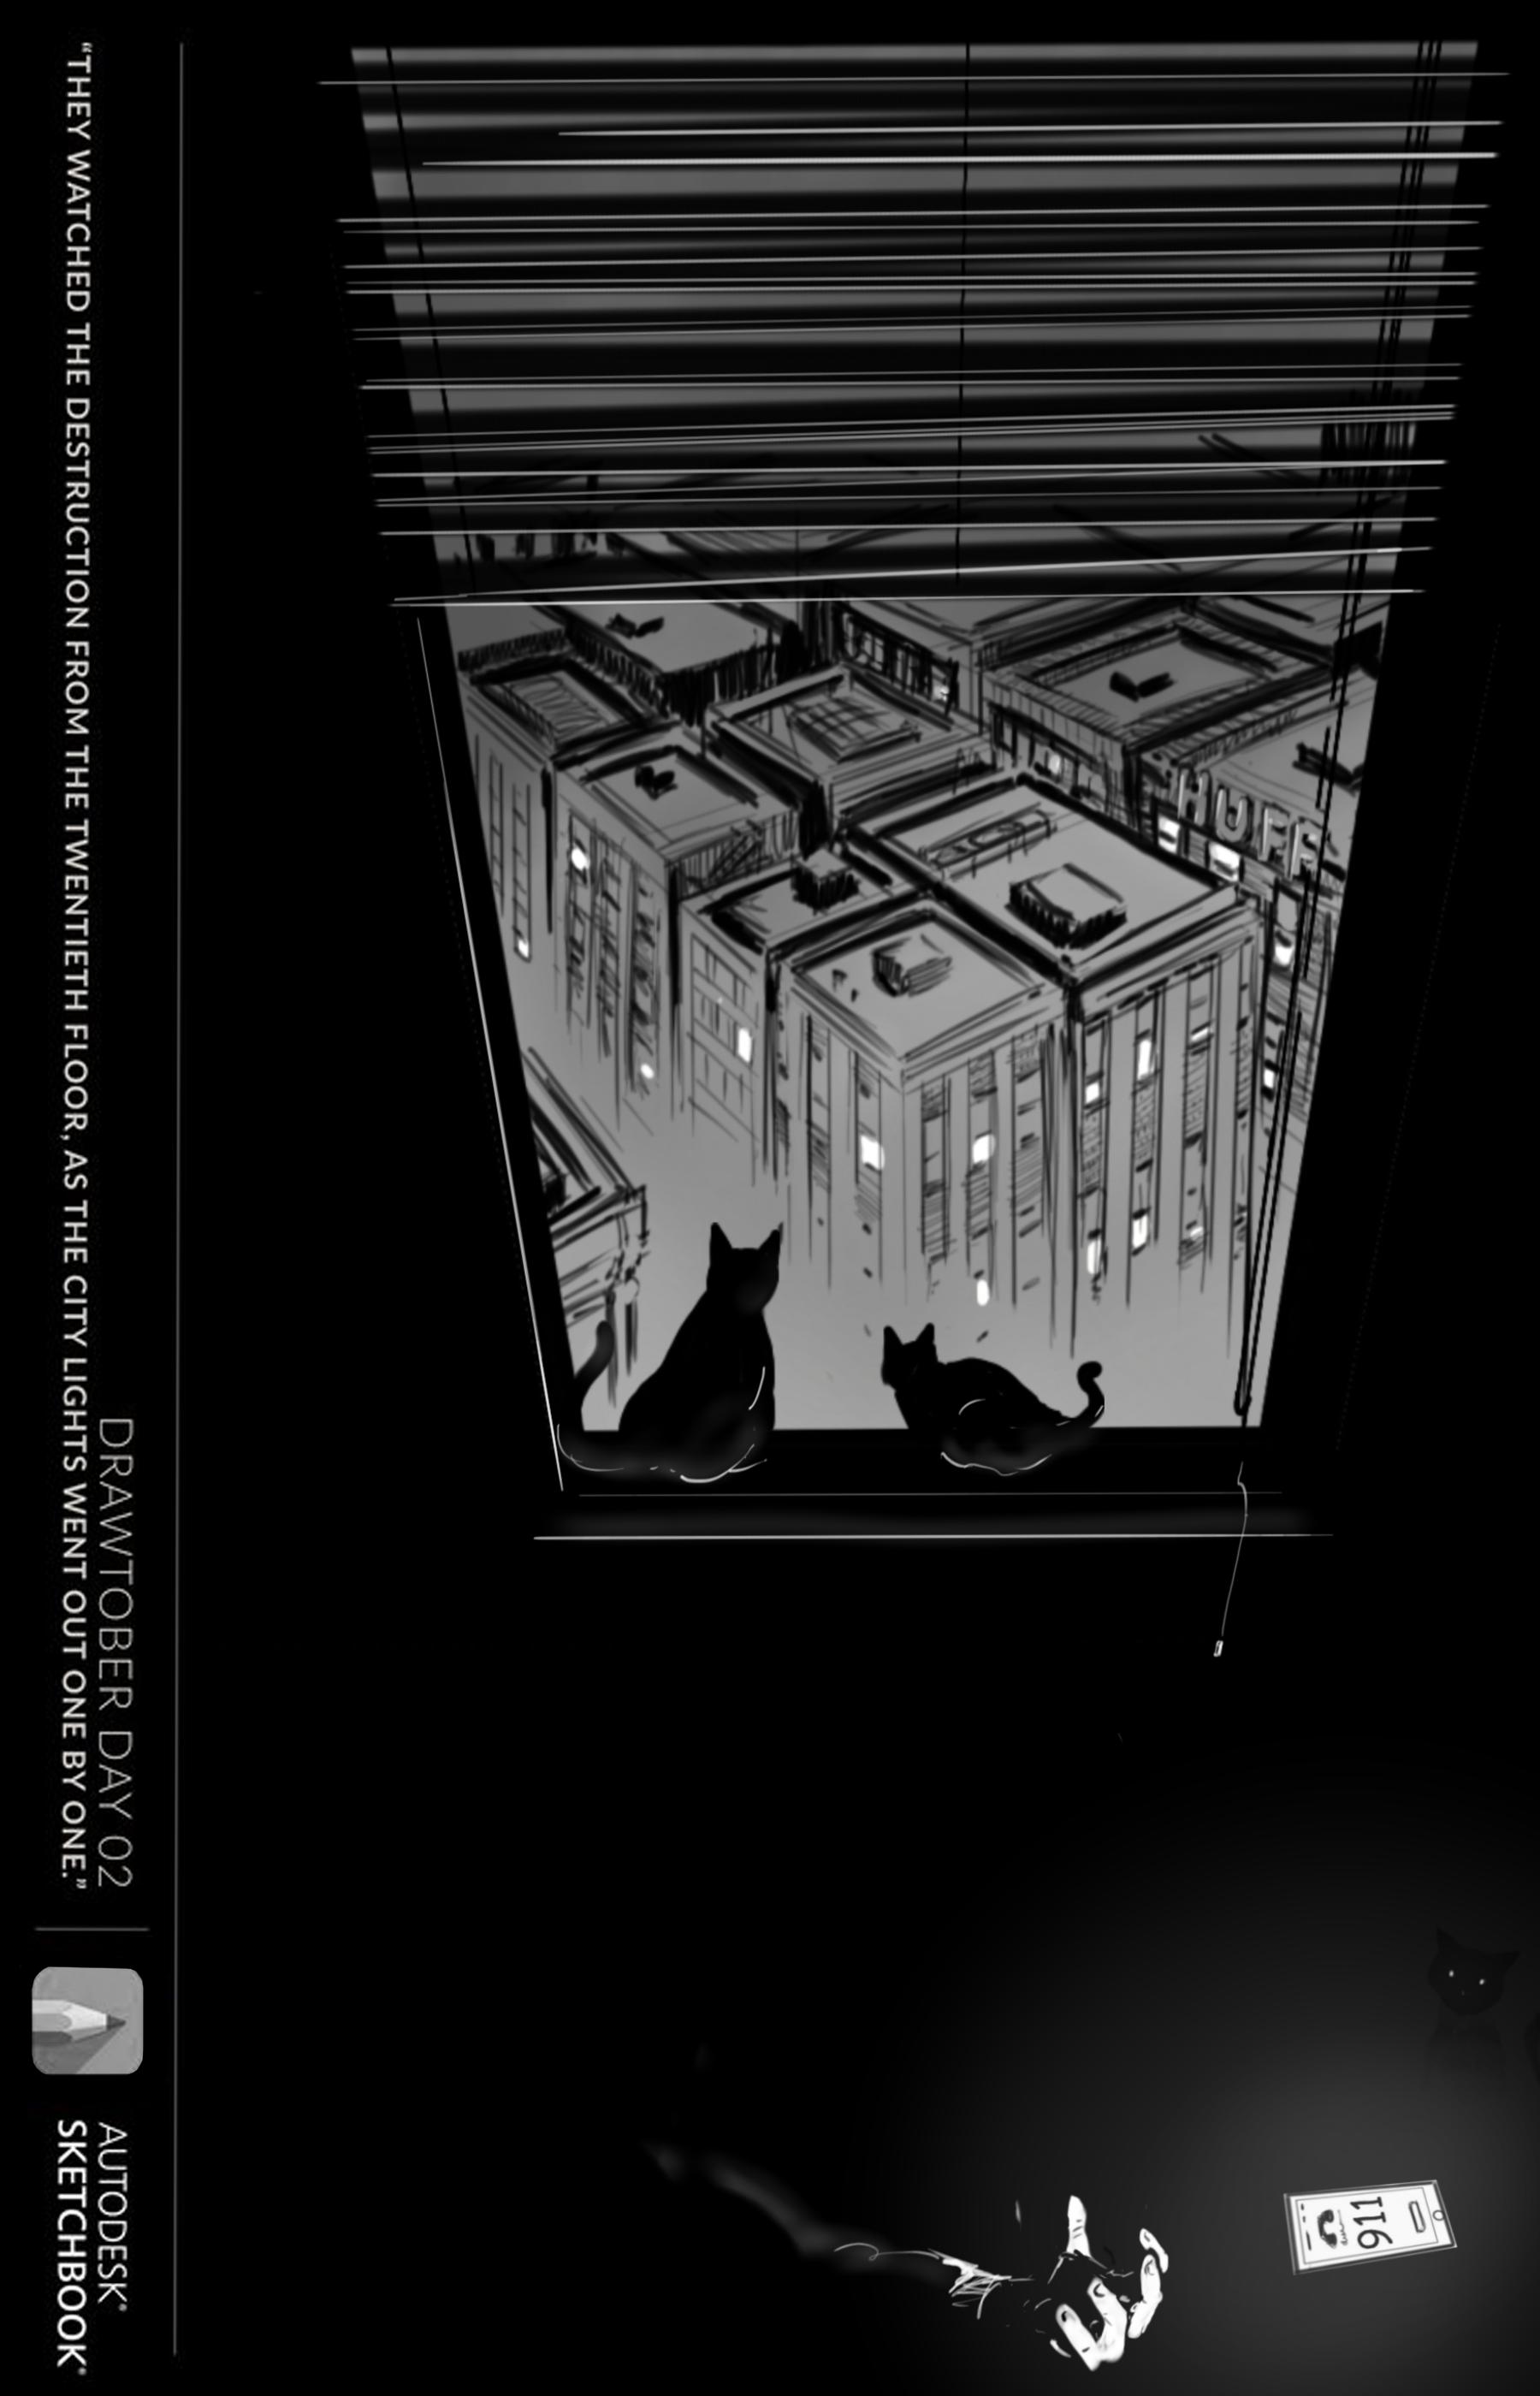 Drawtober Day - 02: Cats-eye view by Huffnstuff